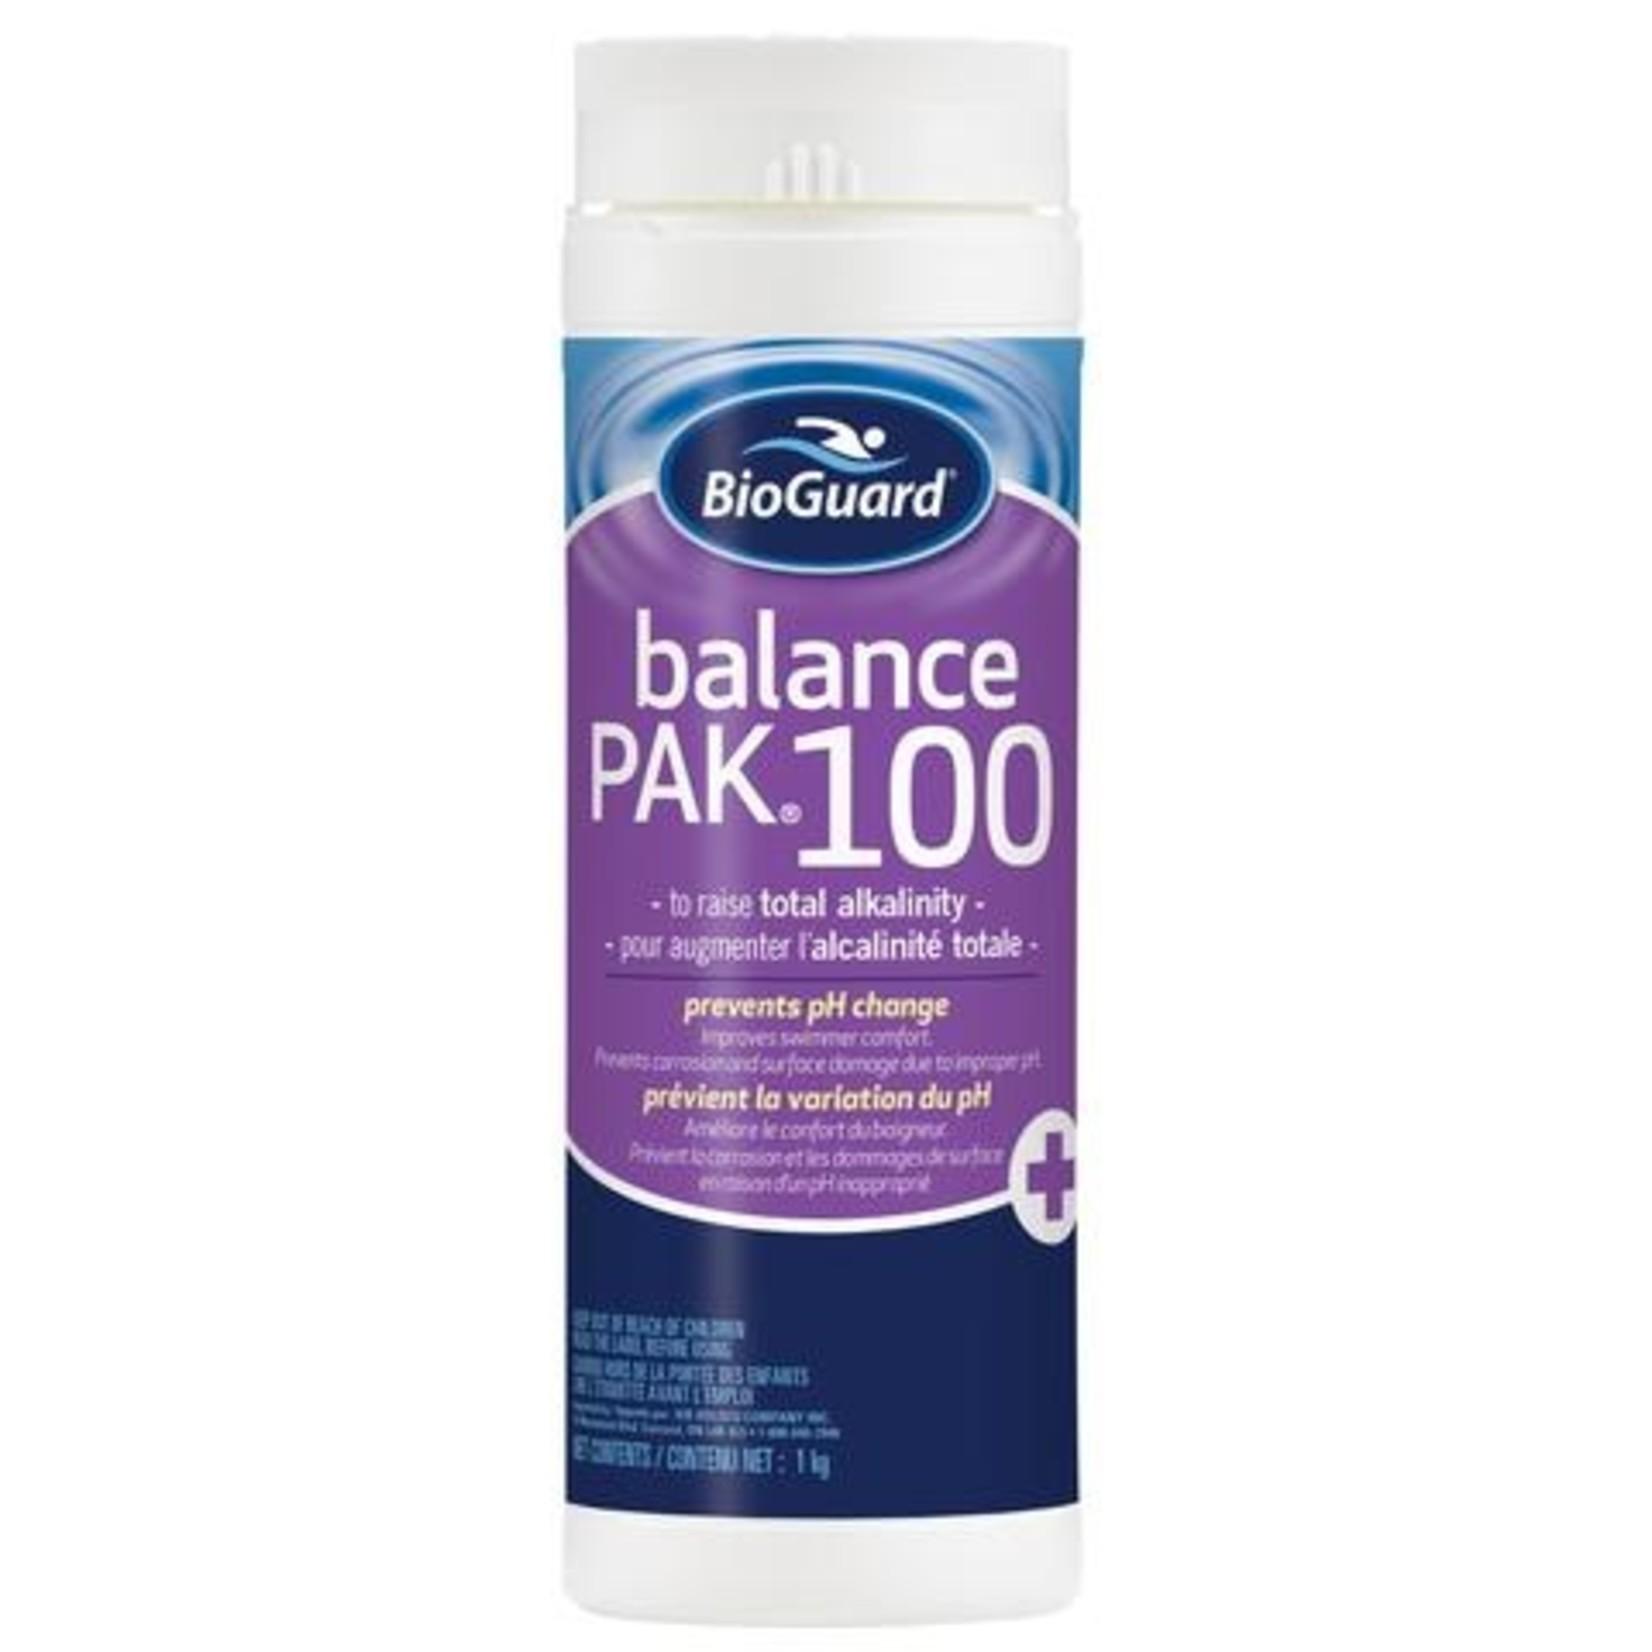 BioGuard Balance Pak® 100 (1 kg)